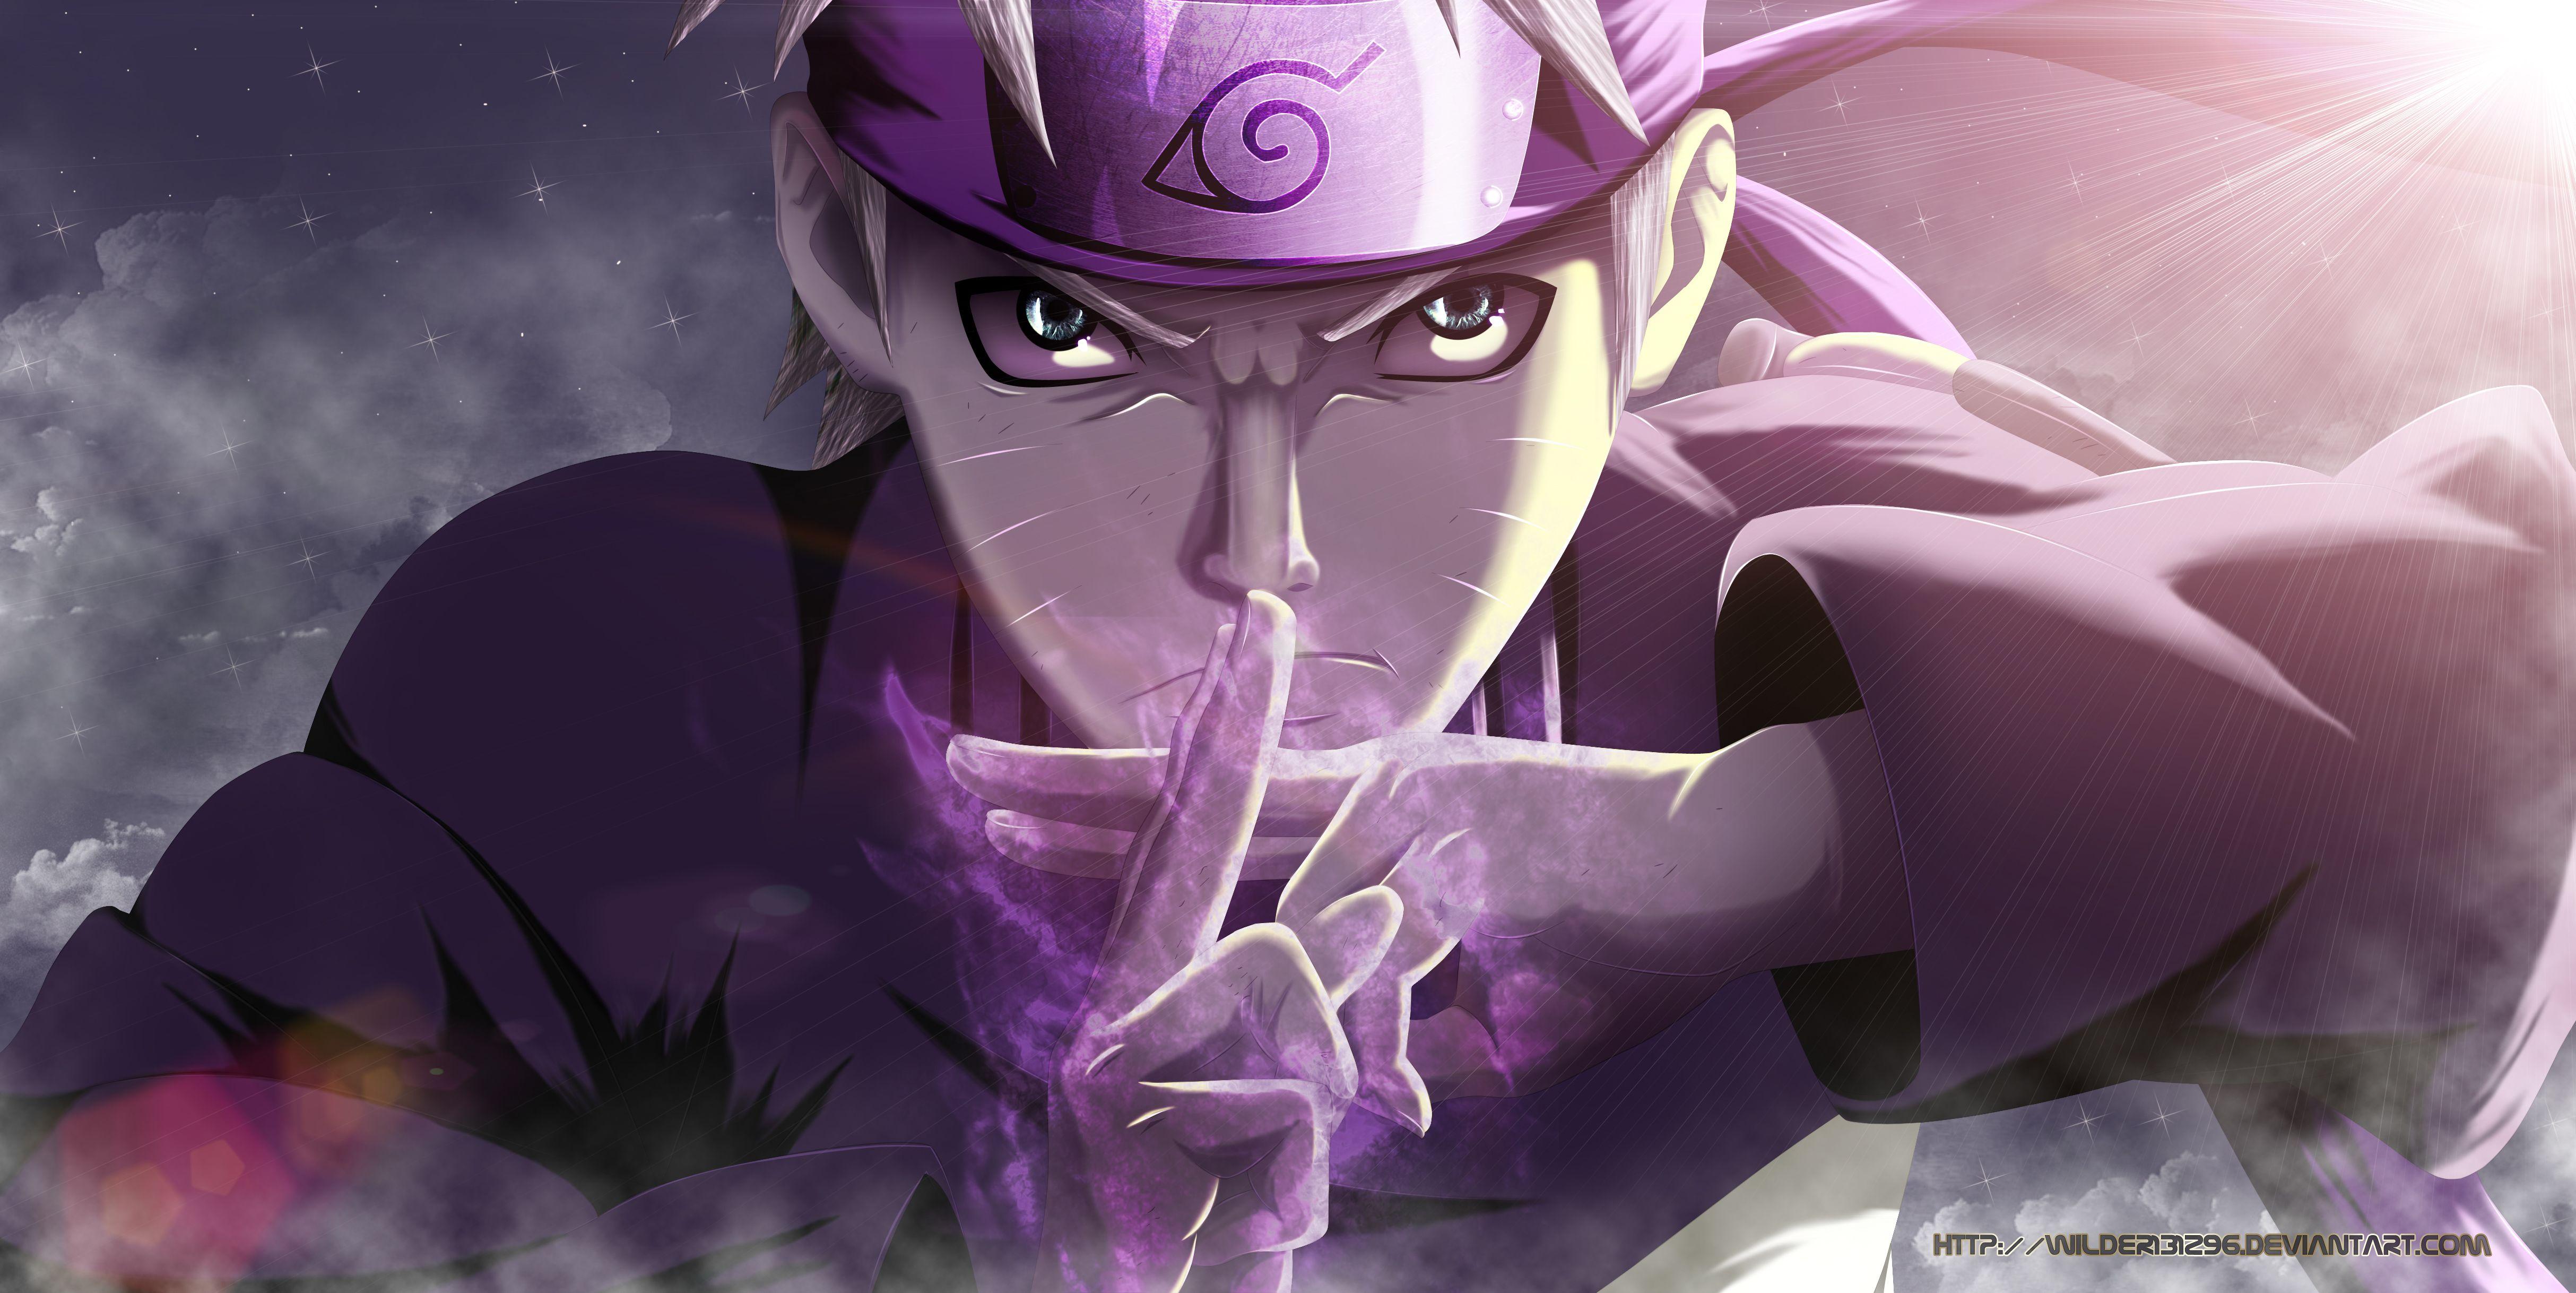 Naruto & Naruto Shippuden Filler Episodes List